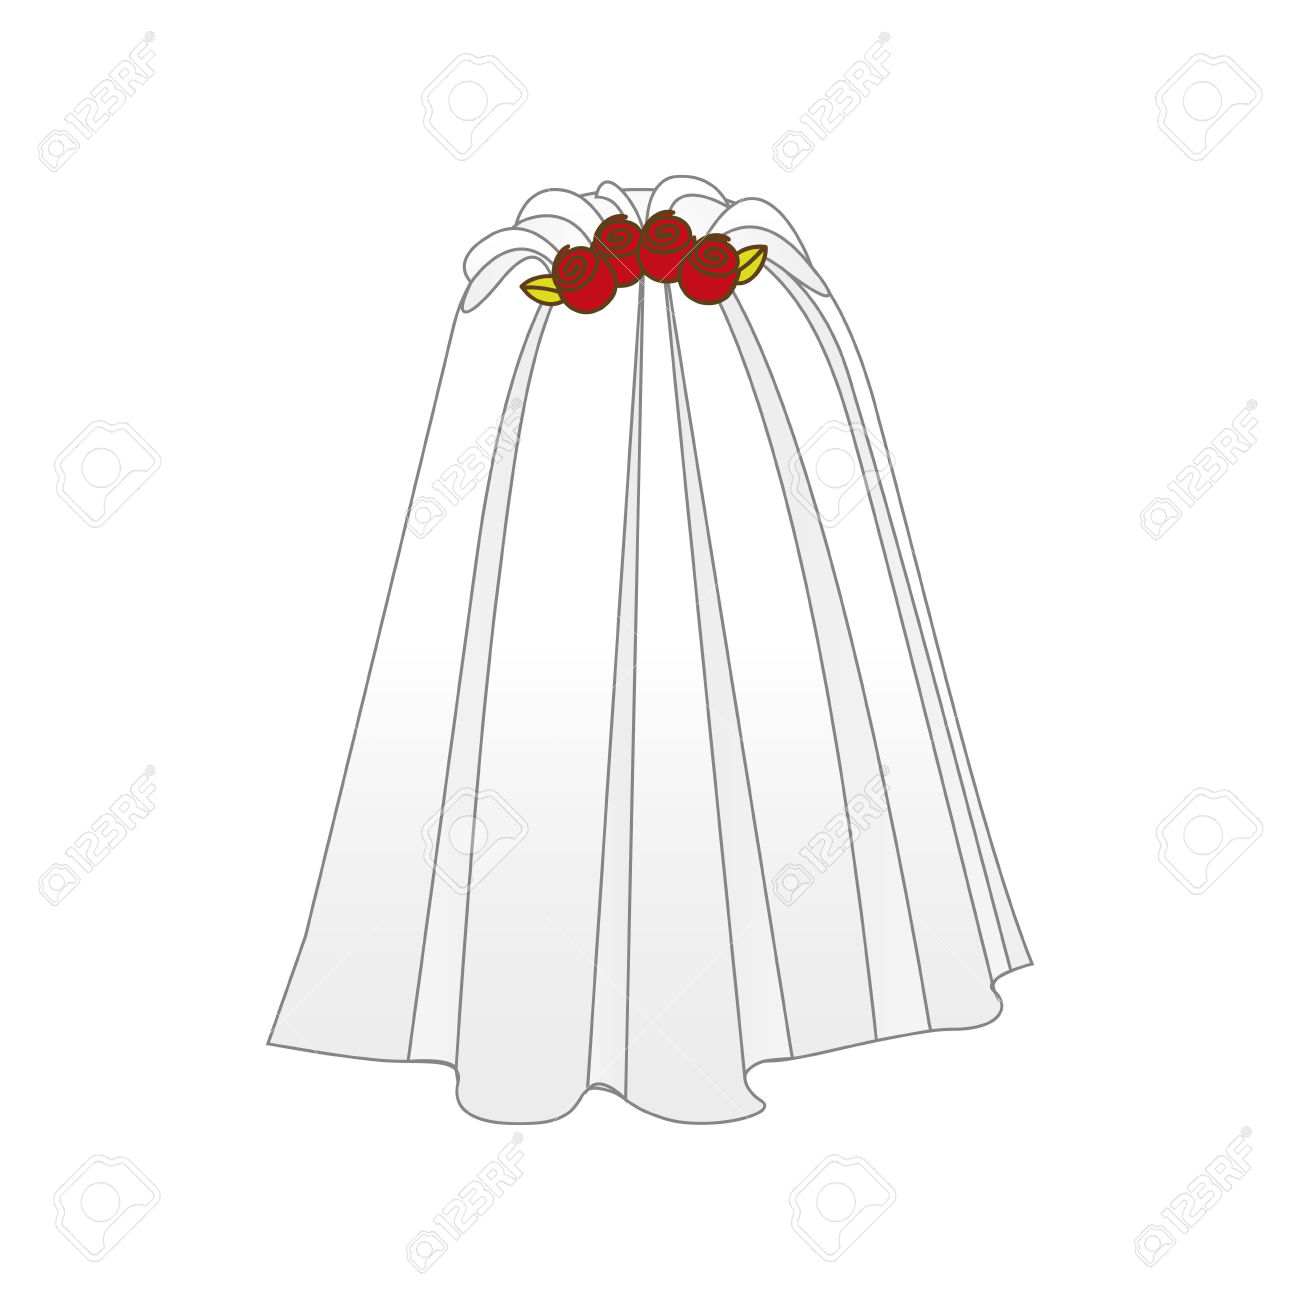 bridal veil joke battles wikia fandom powered by wikia rh joke battles wikia com Wedding Bouquet Clip Art wedding veil clipart black and white